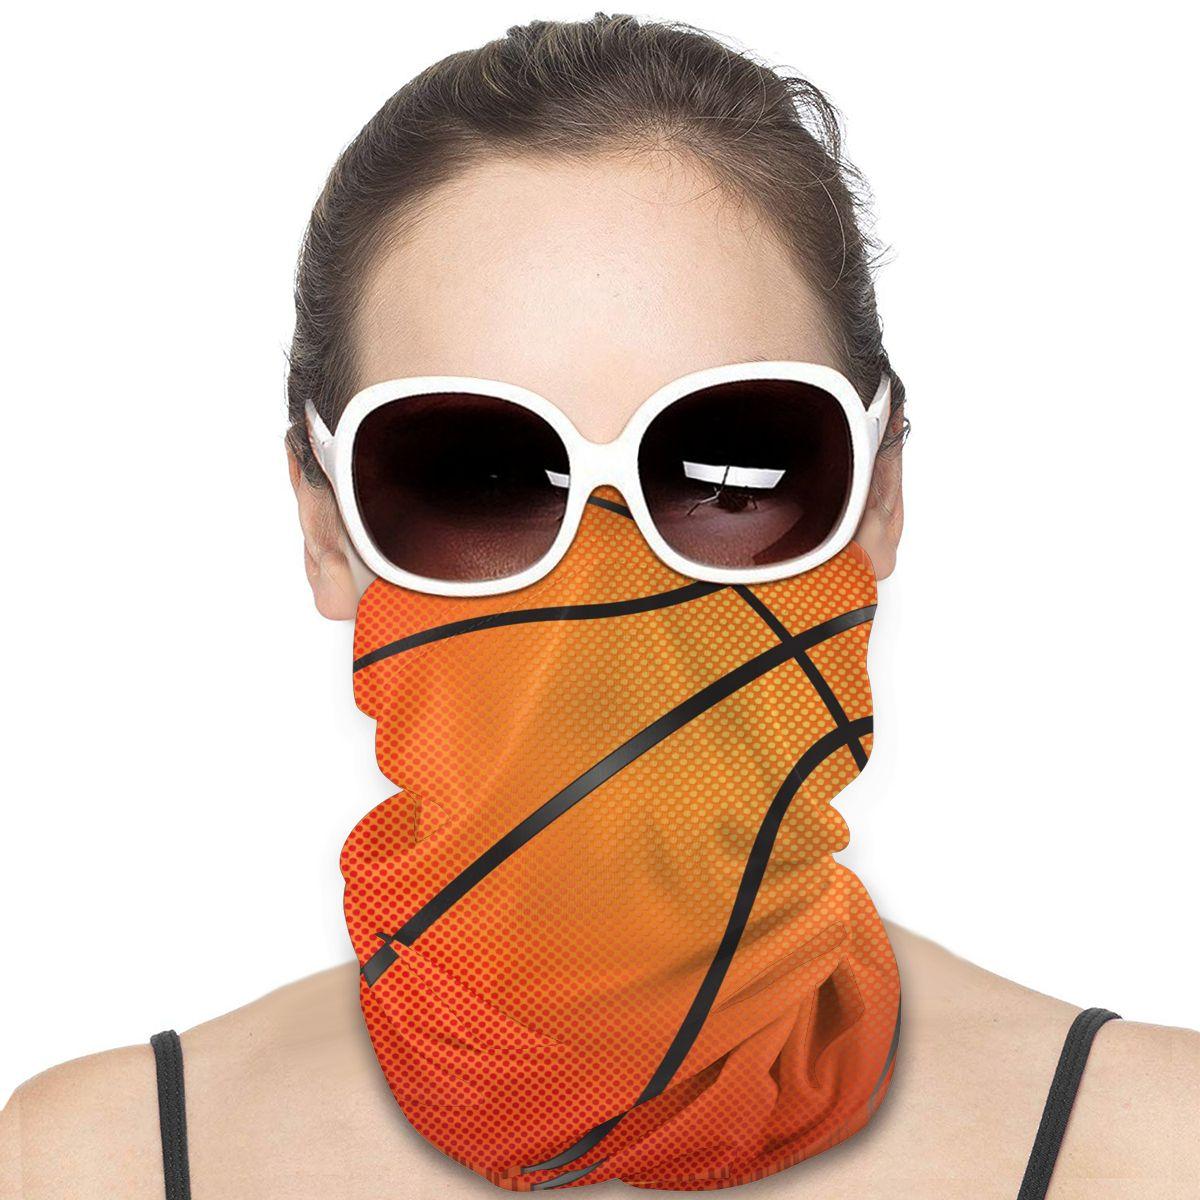 Impresión de baloncesto hombre mujer diadema cuello polaina cubierta ligera protección solar UV protección contra el polvo para exterior